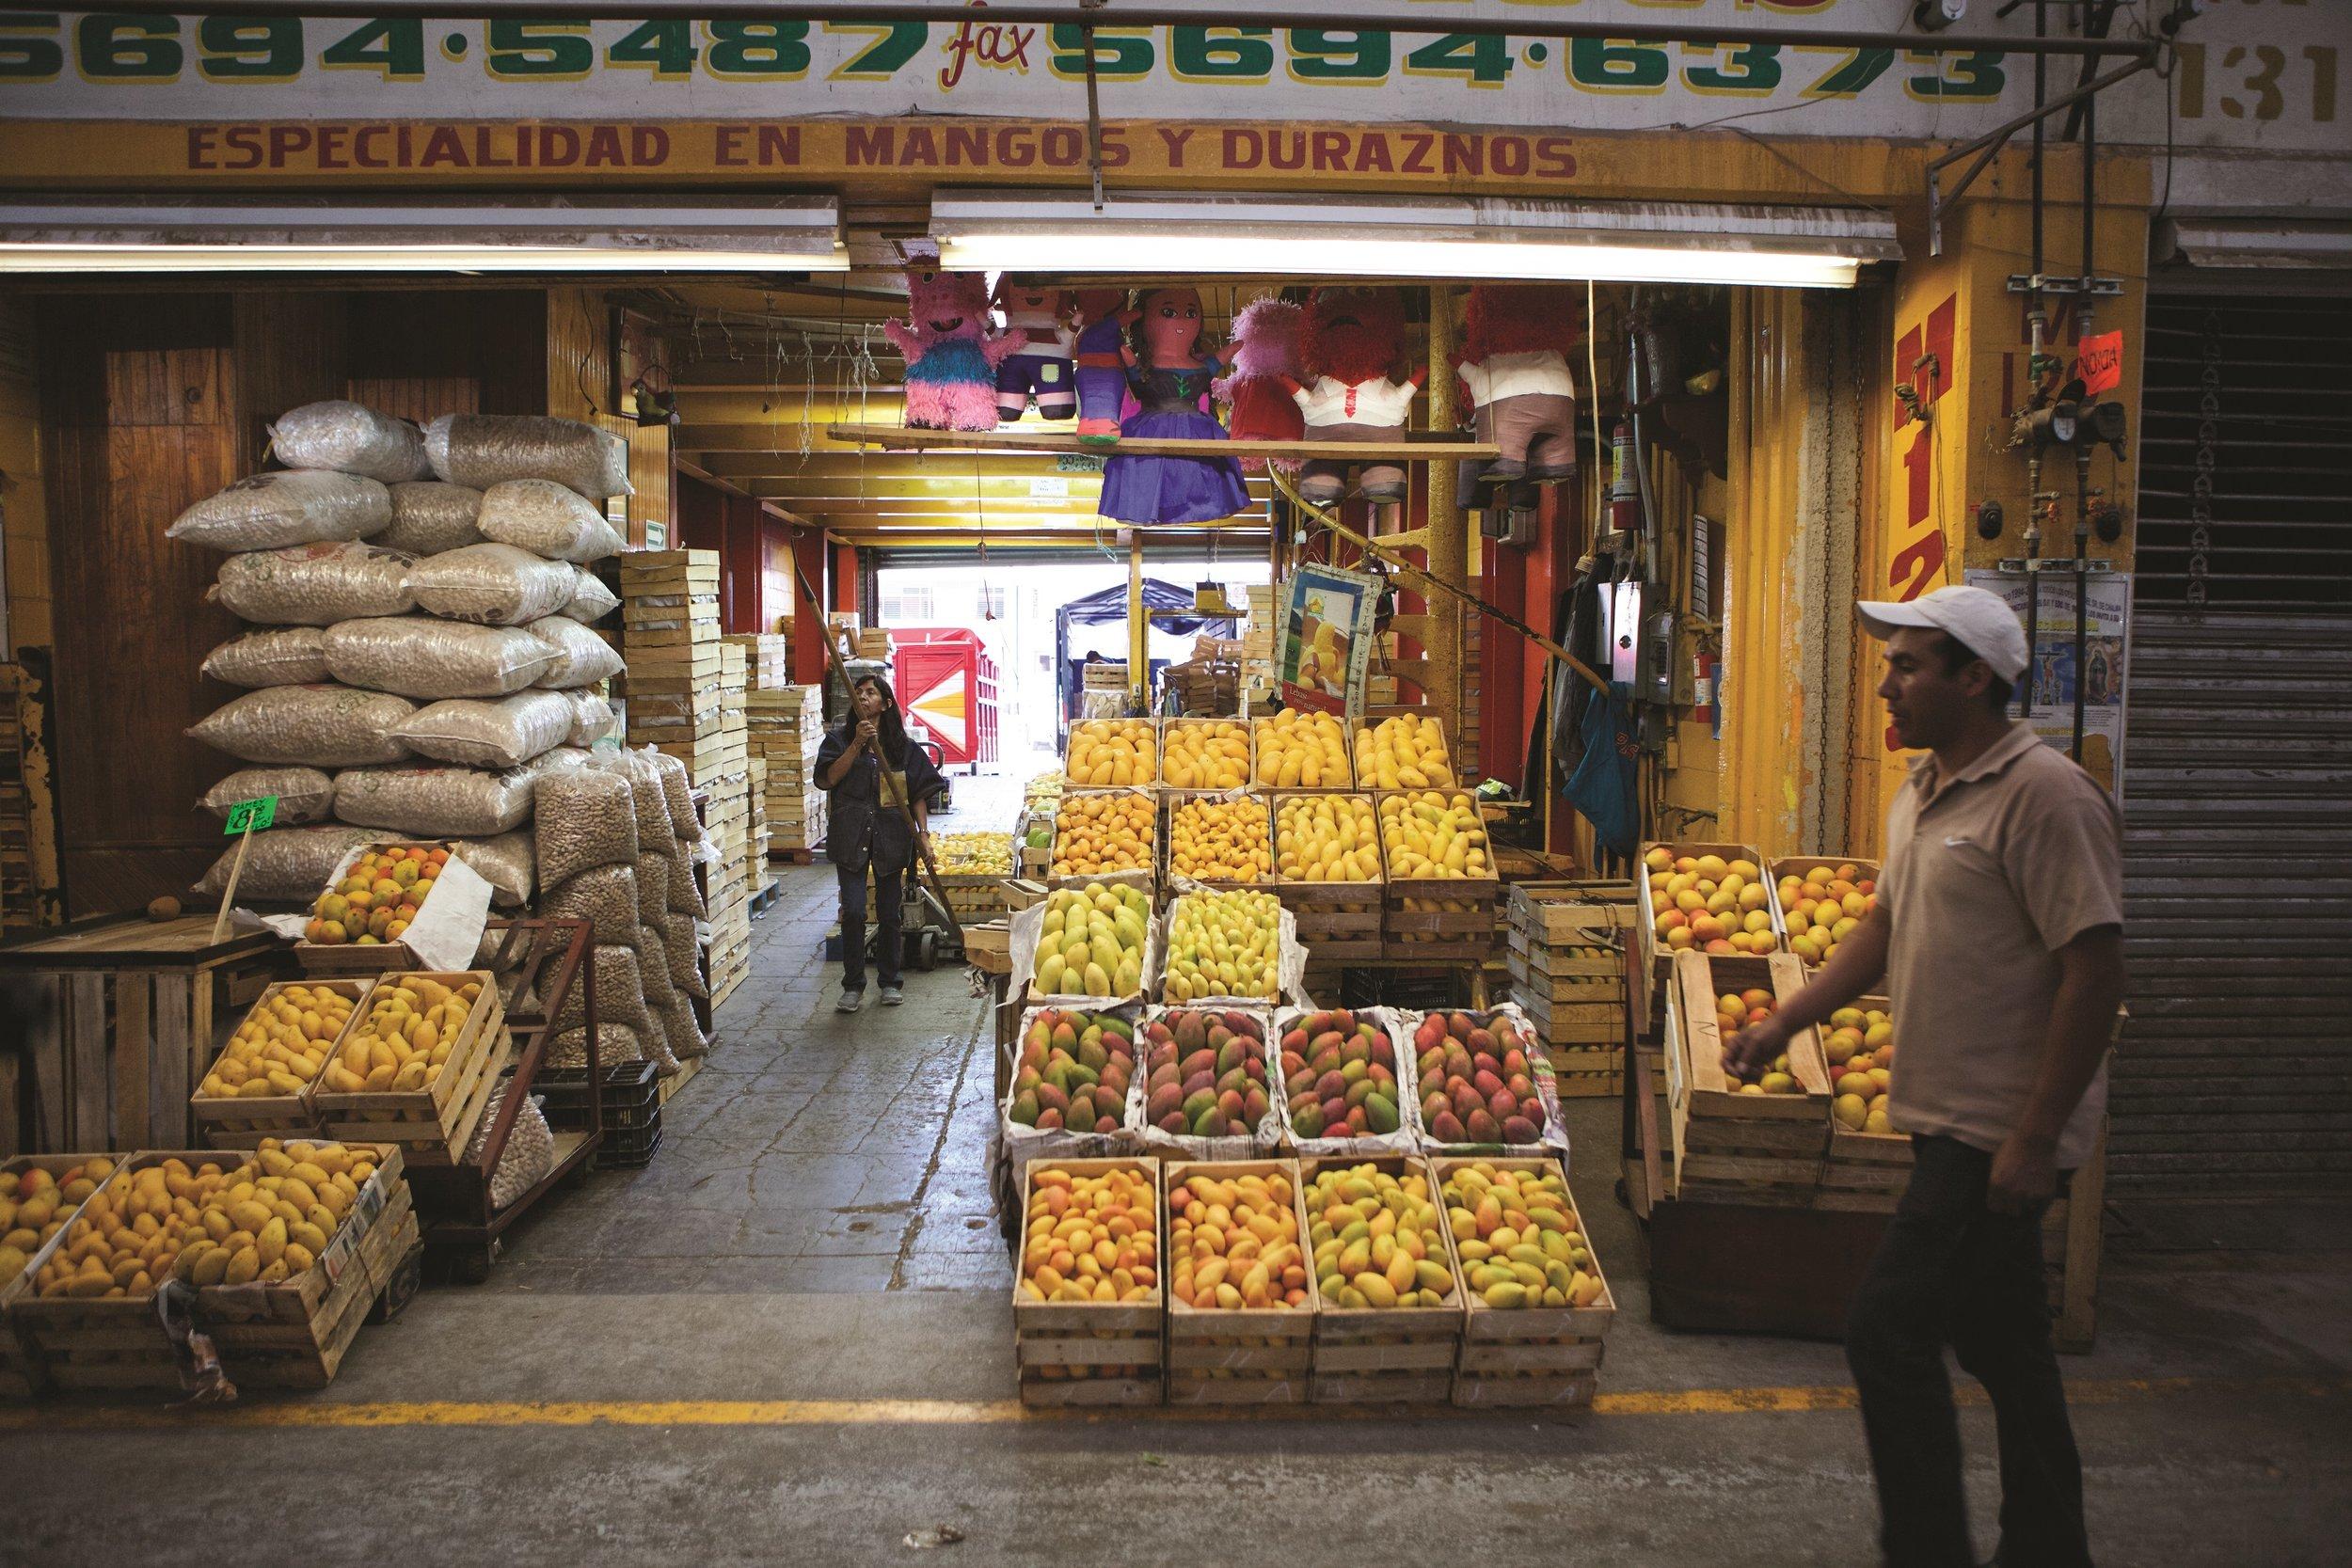 Copy of cartes full of mangos at a Mexico City market